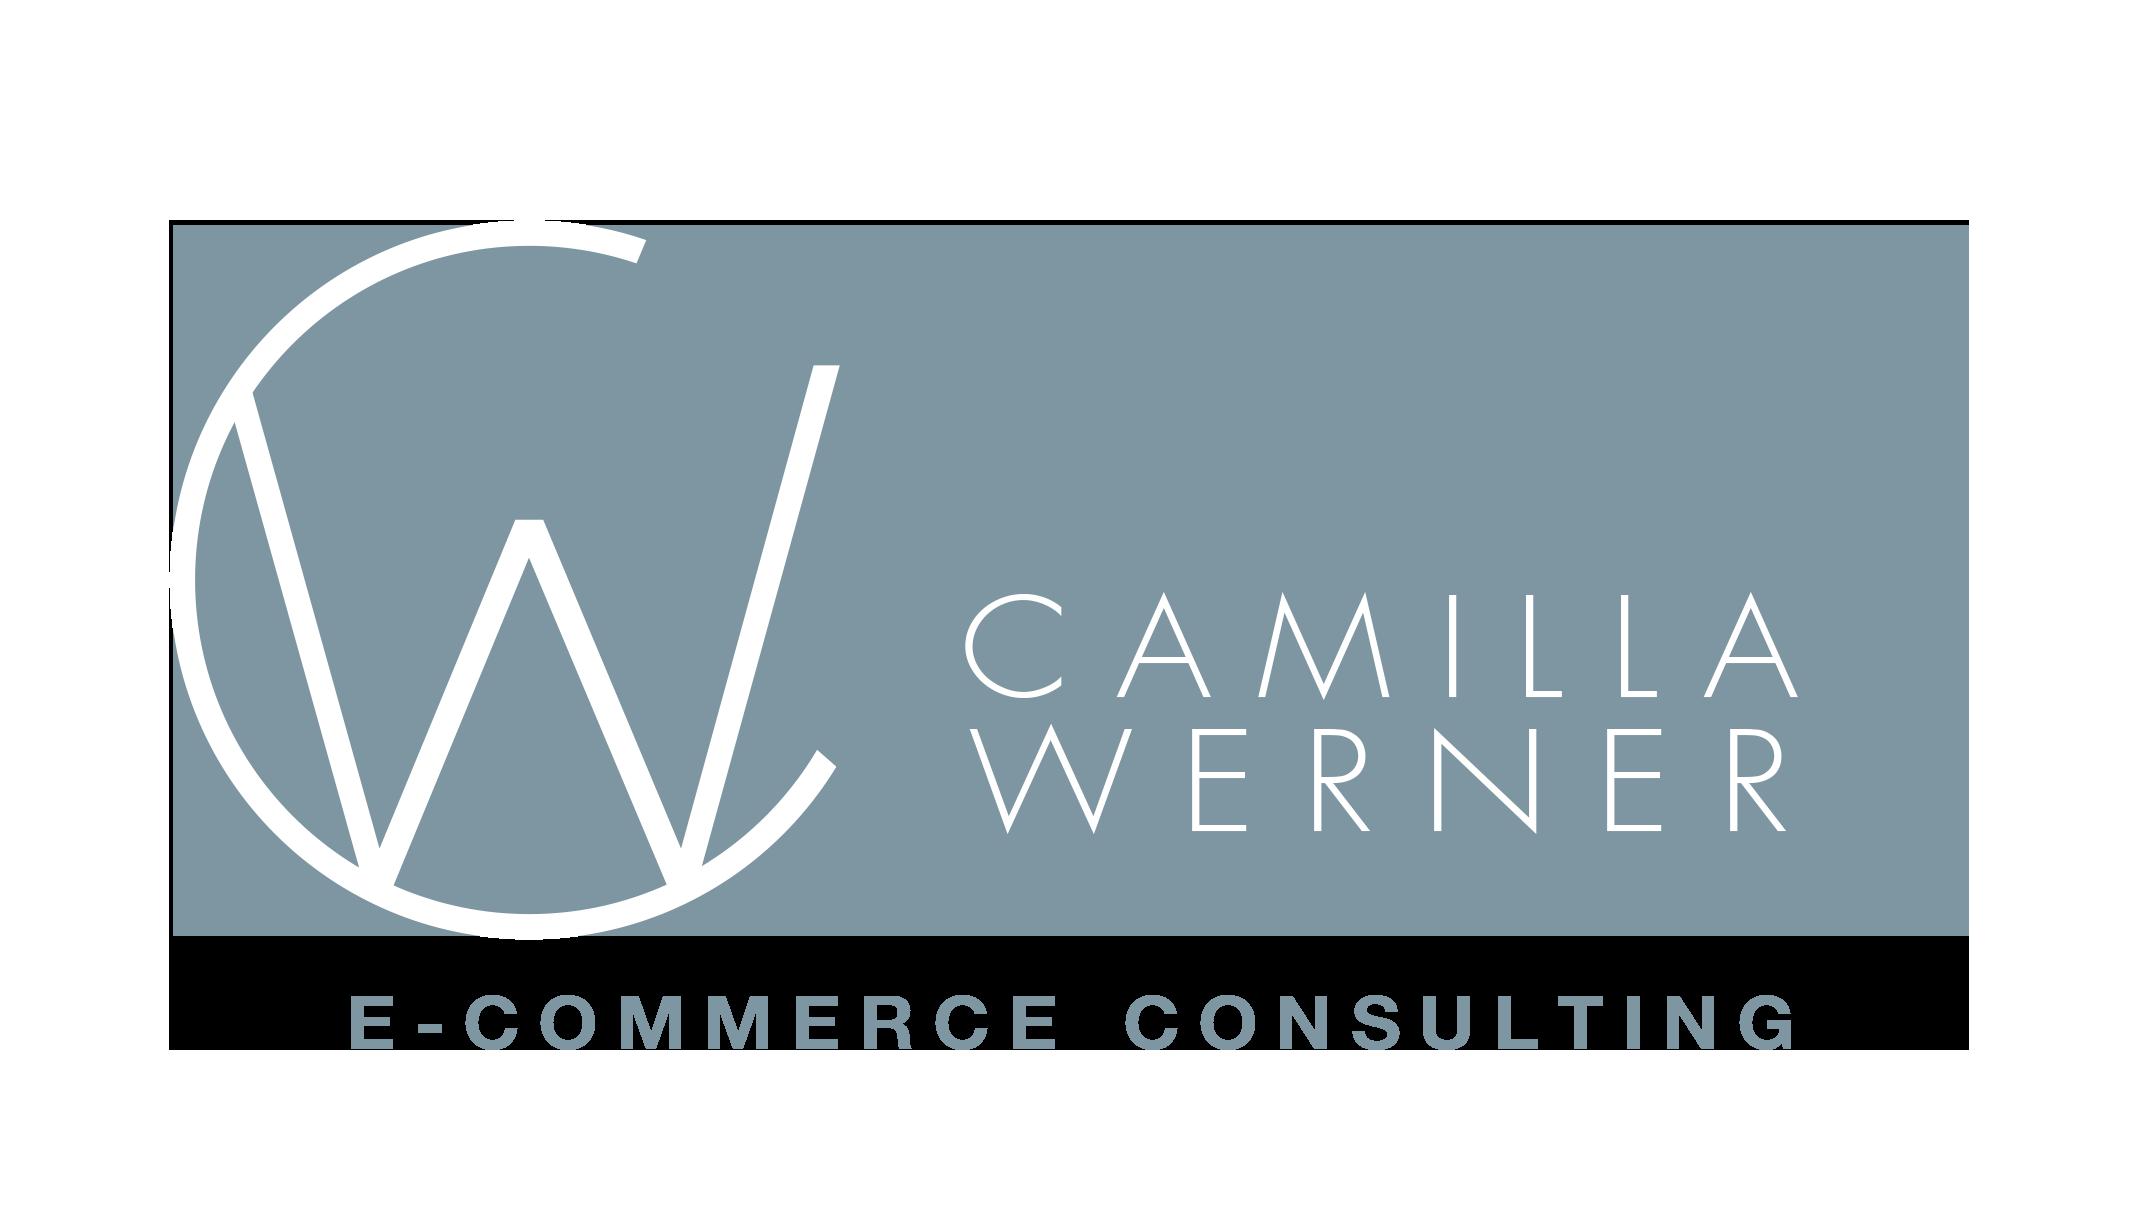 Camilla Werner